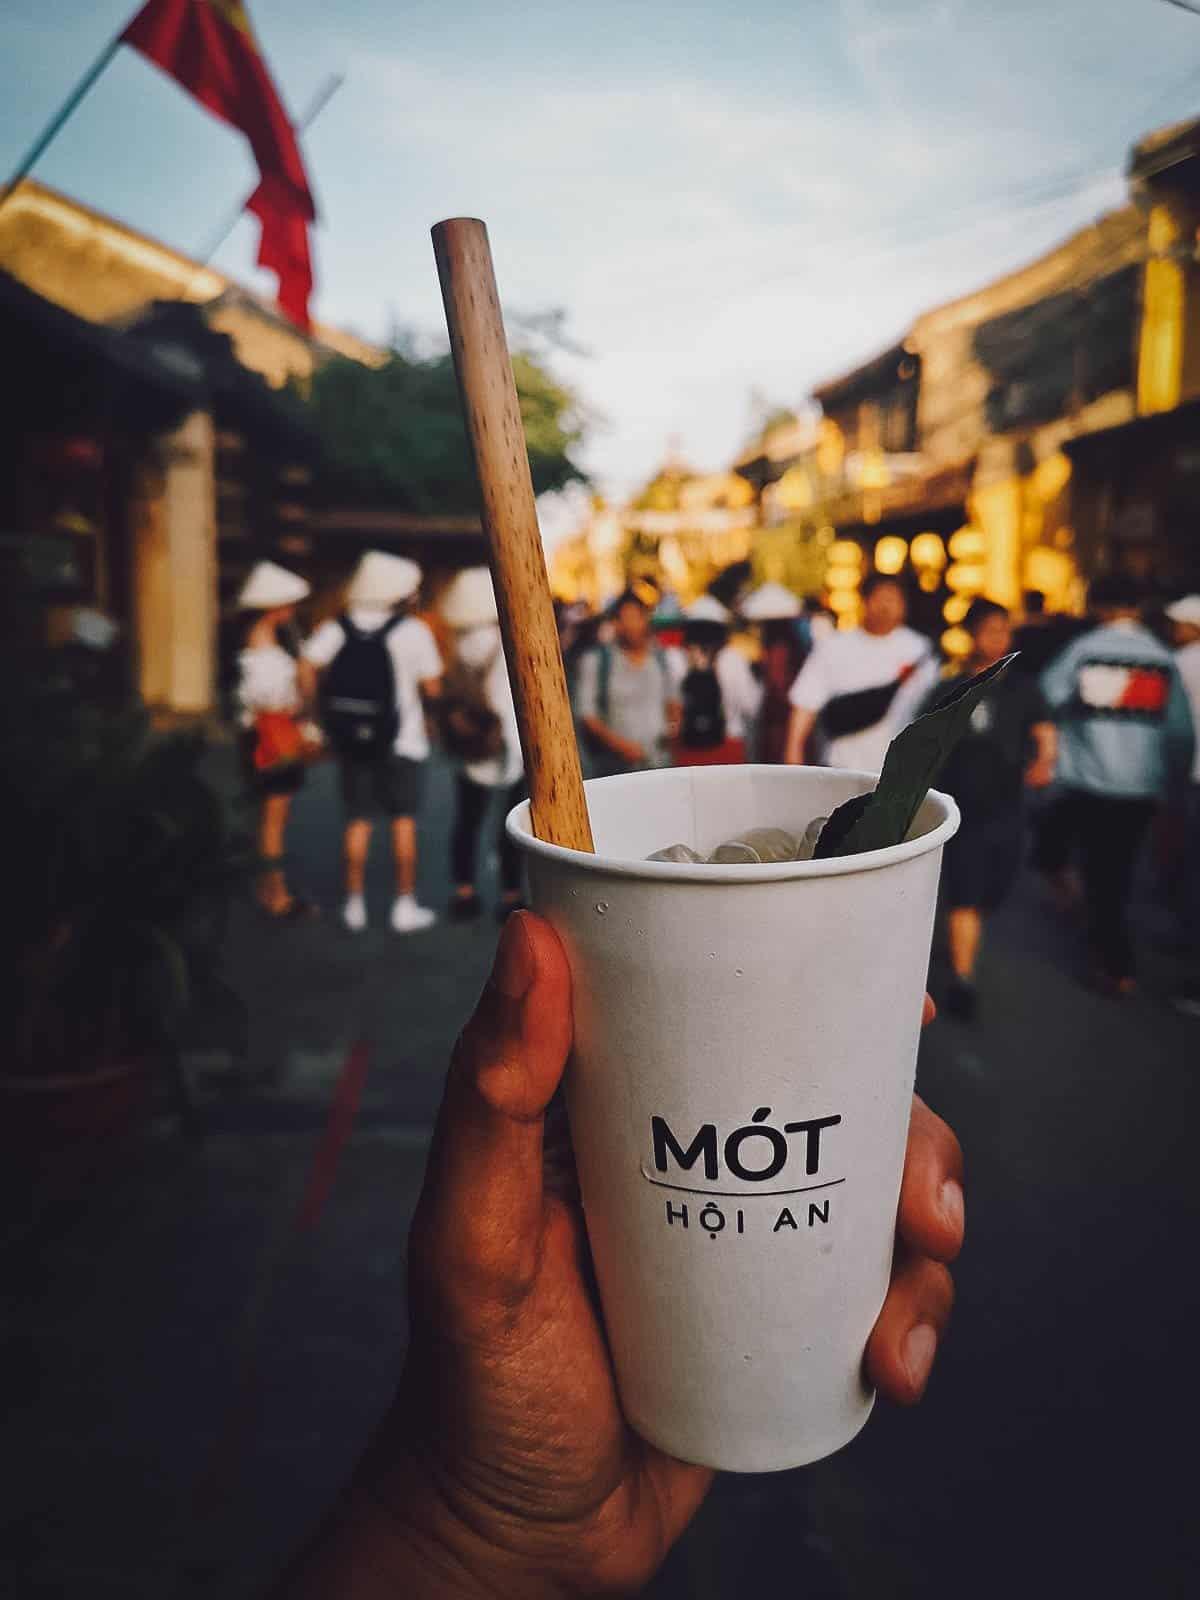 Herbal tea from Mot in Hoi An, Vietnam